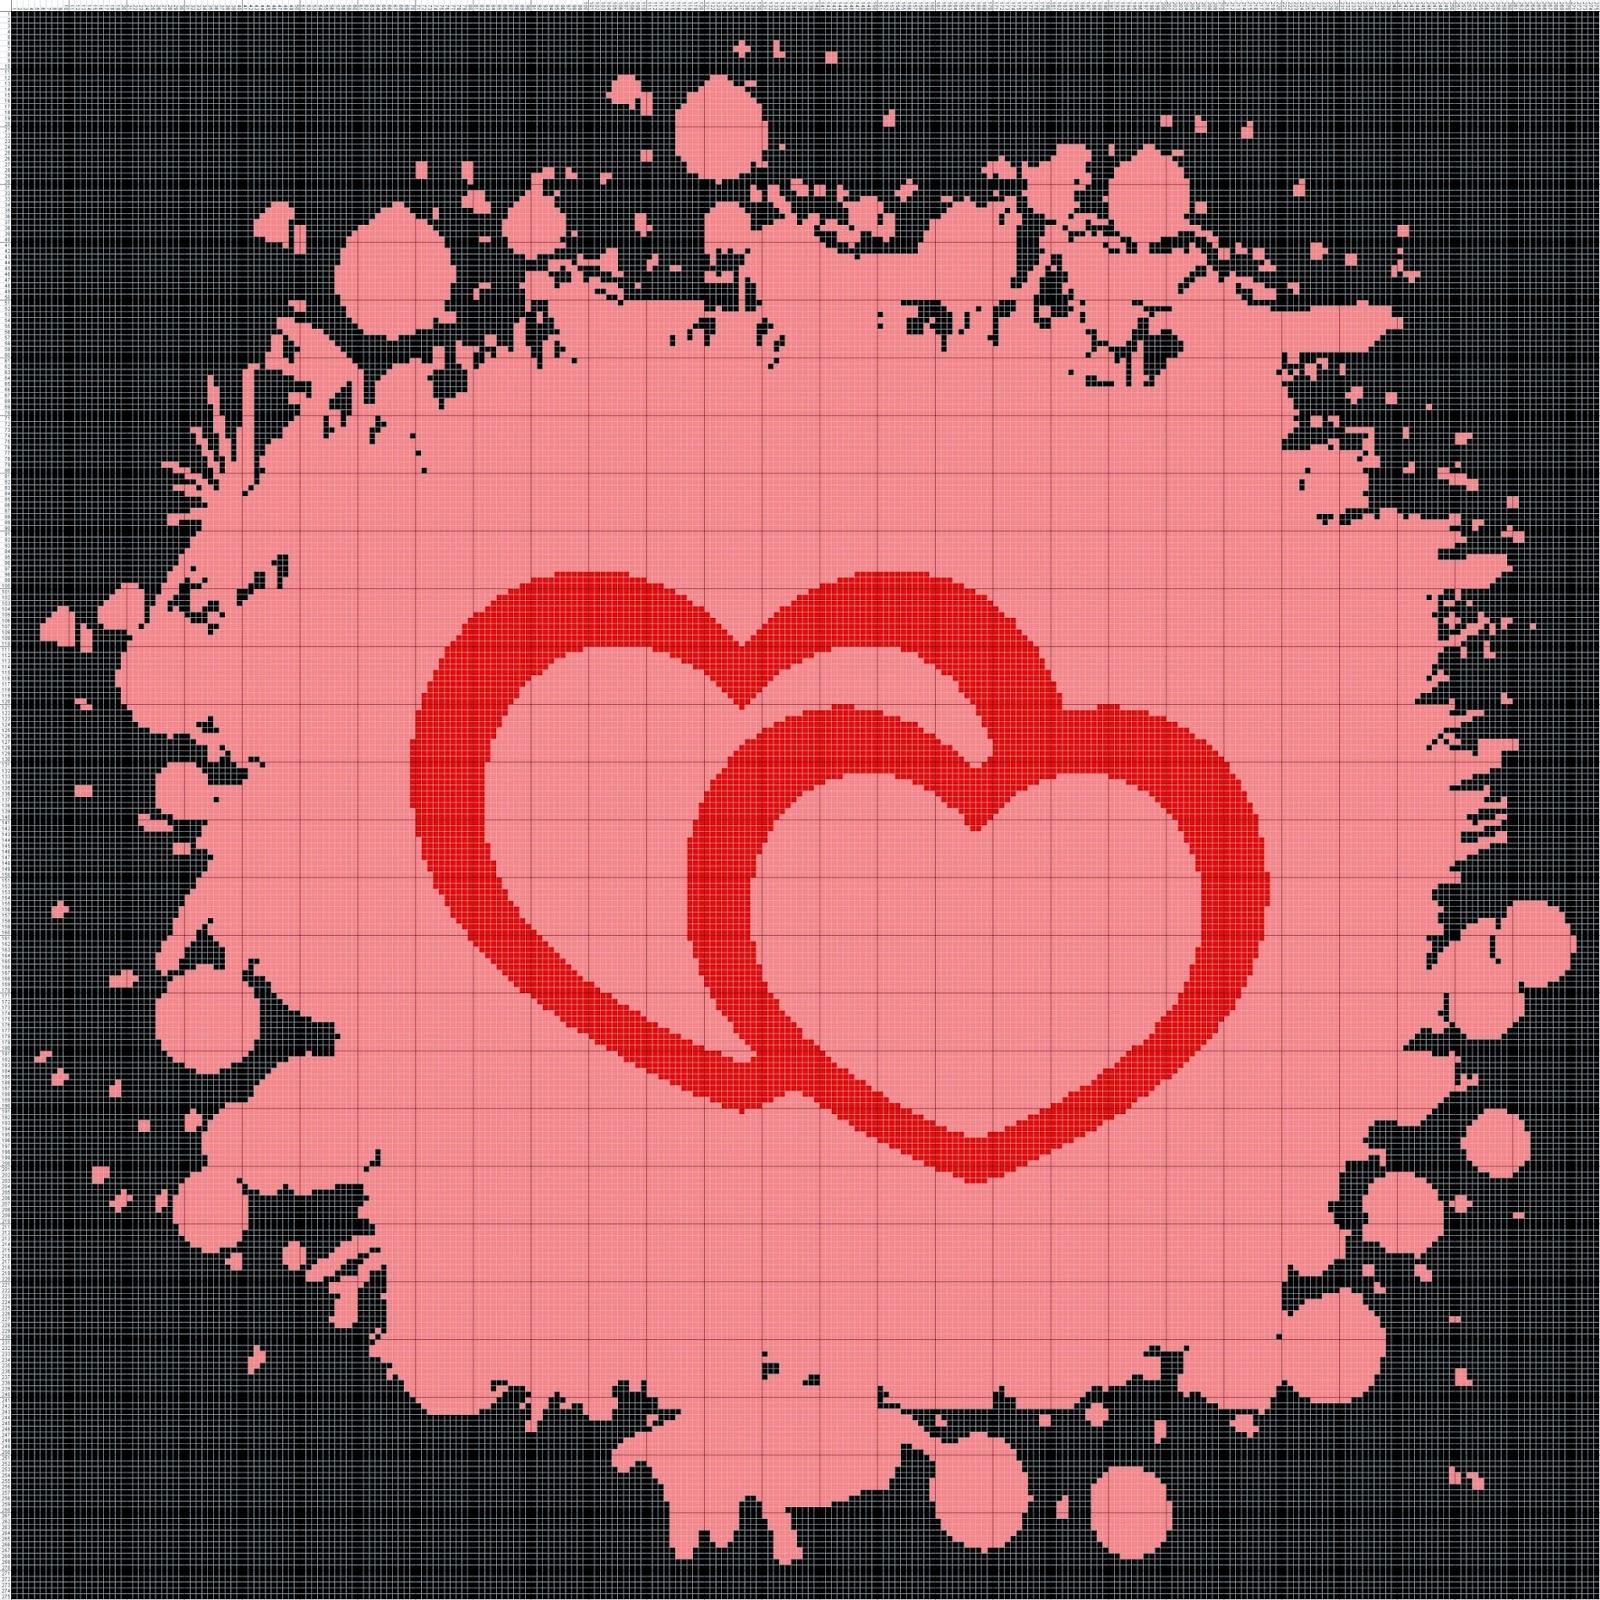 Gambar Pola Kristik Love - Cinta